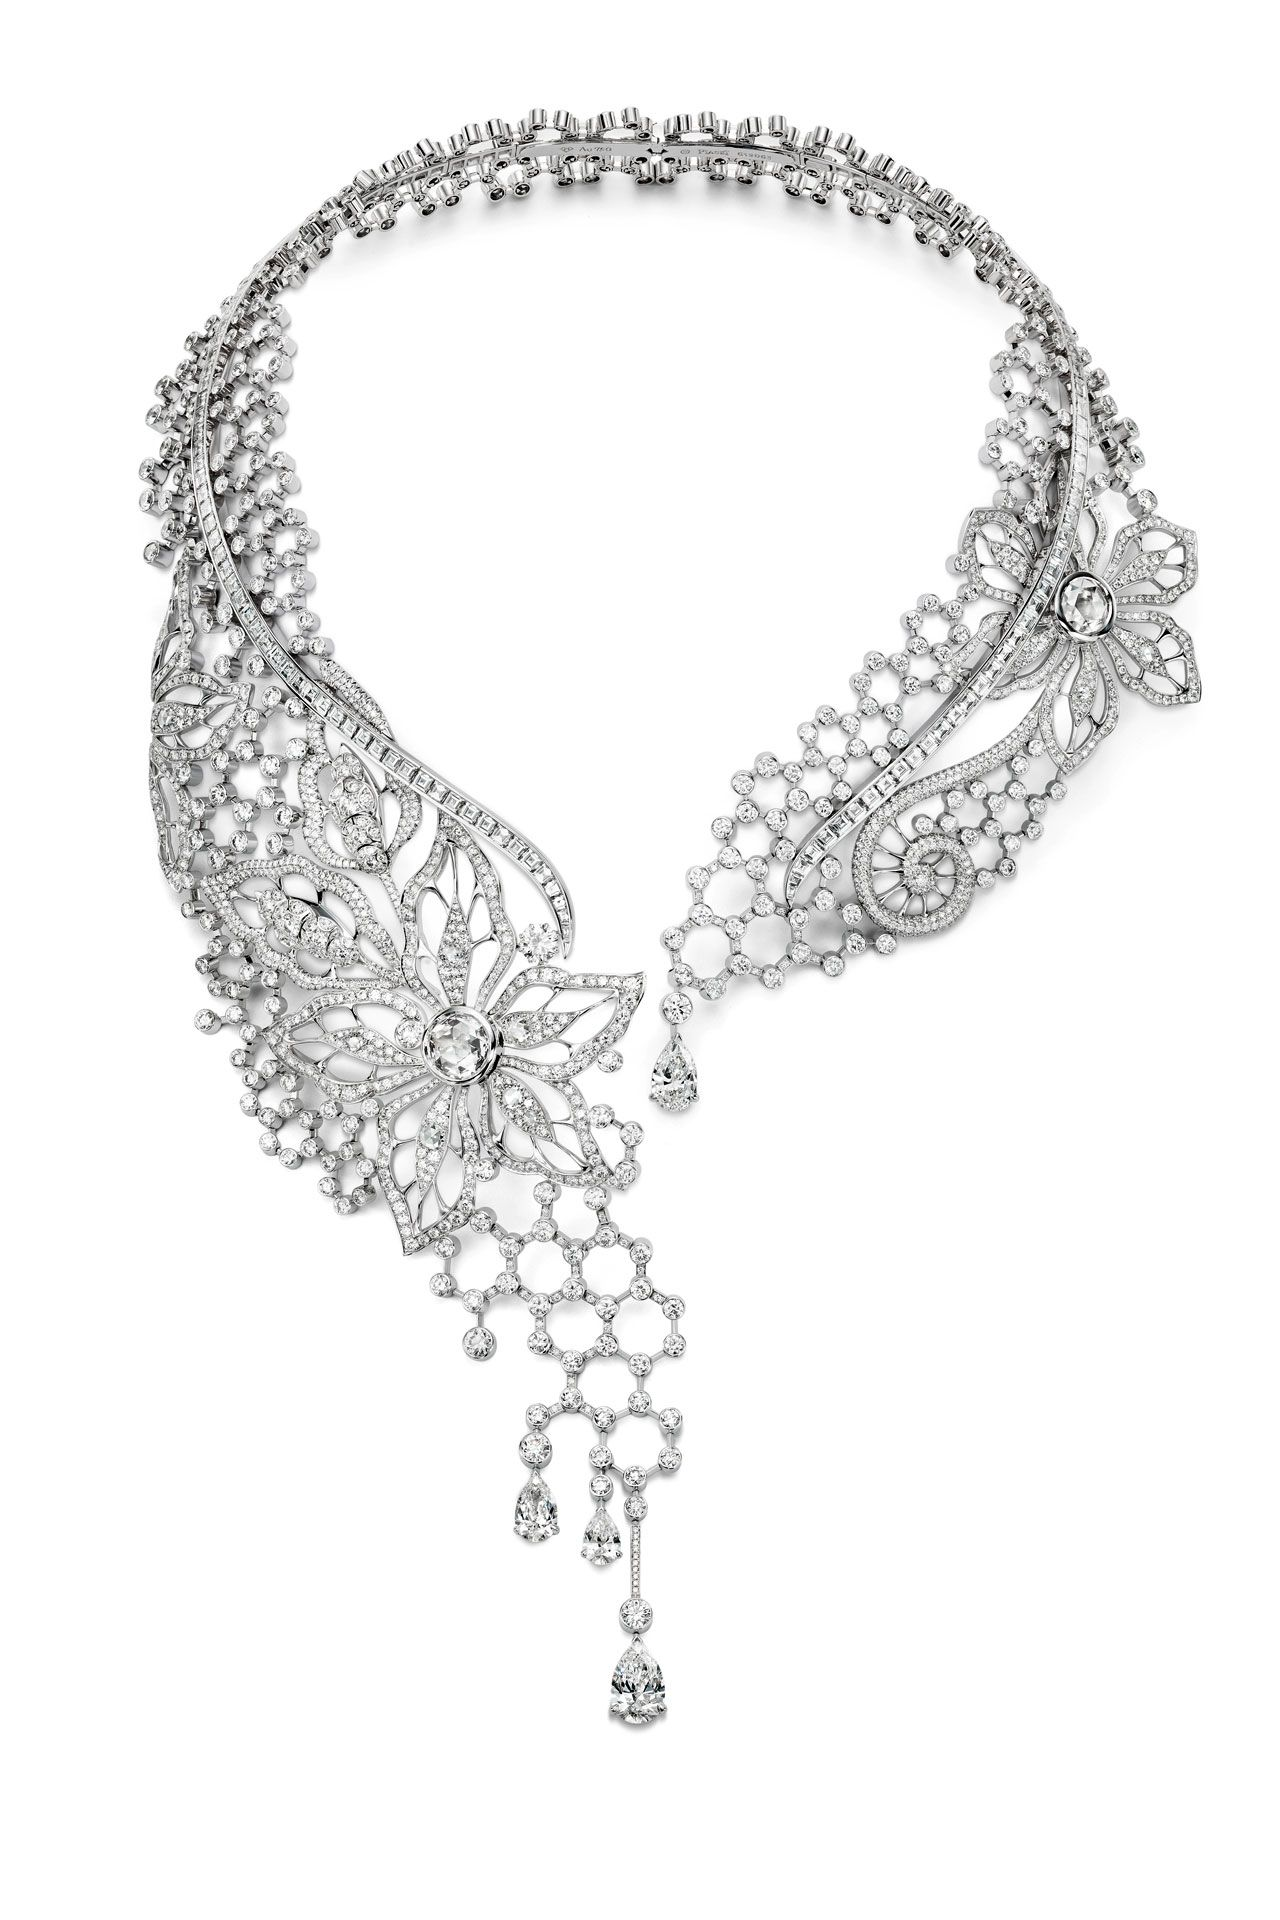 Couture Precieuse Diamond Embroidery Inspiration necklace